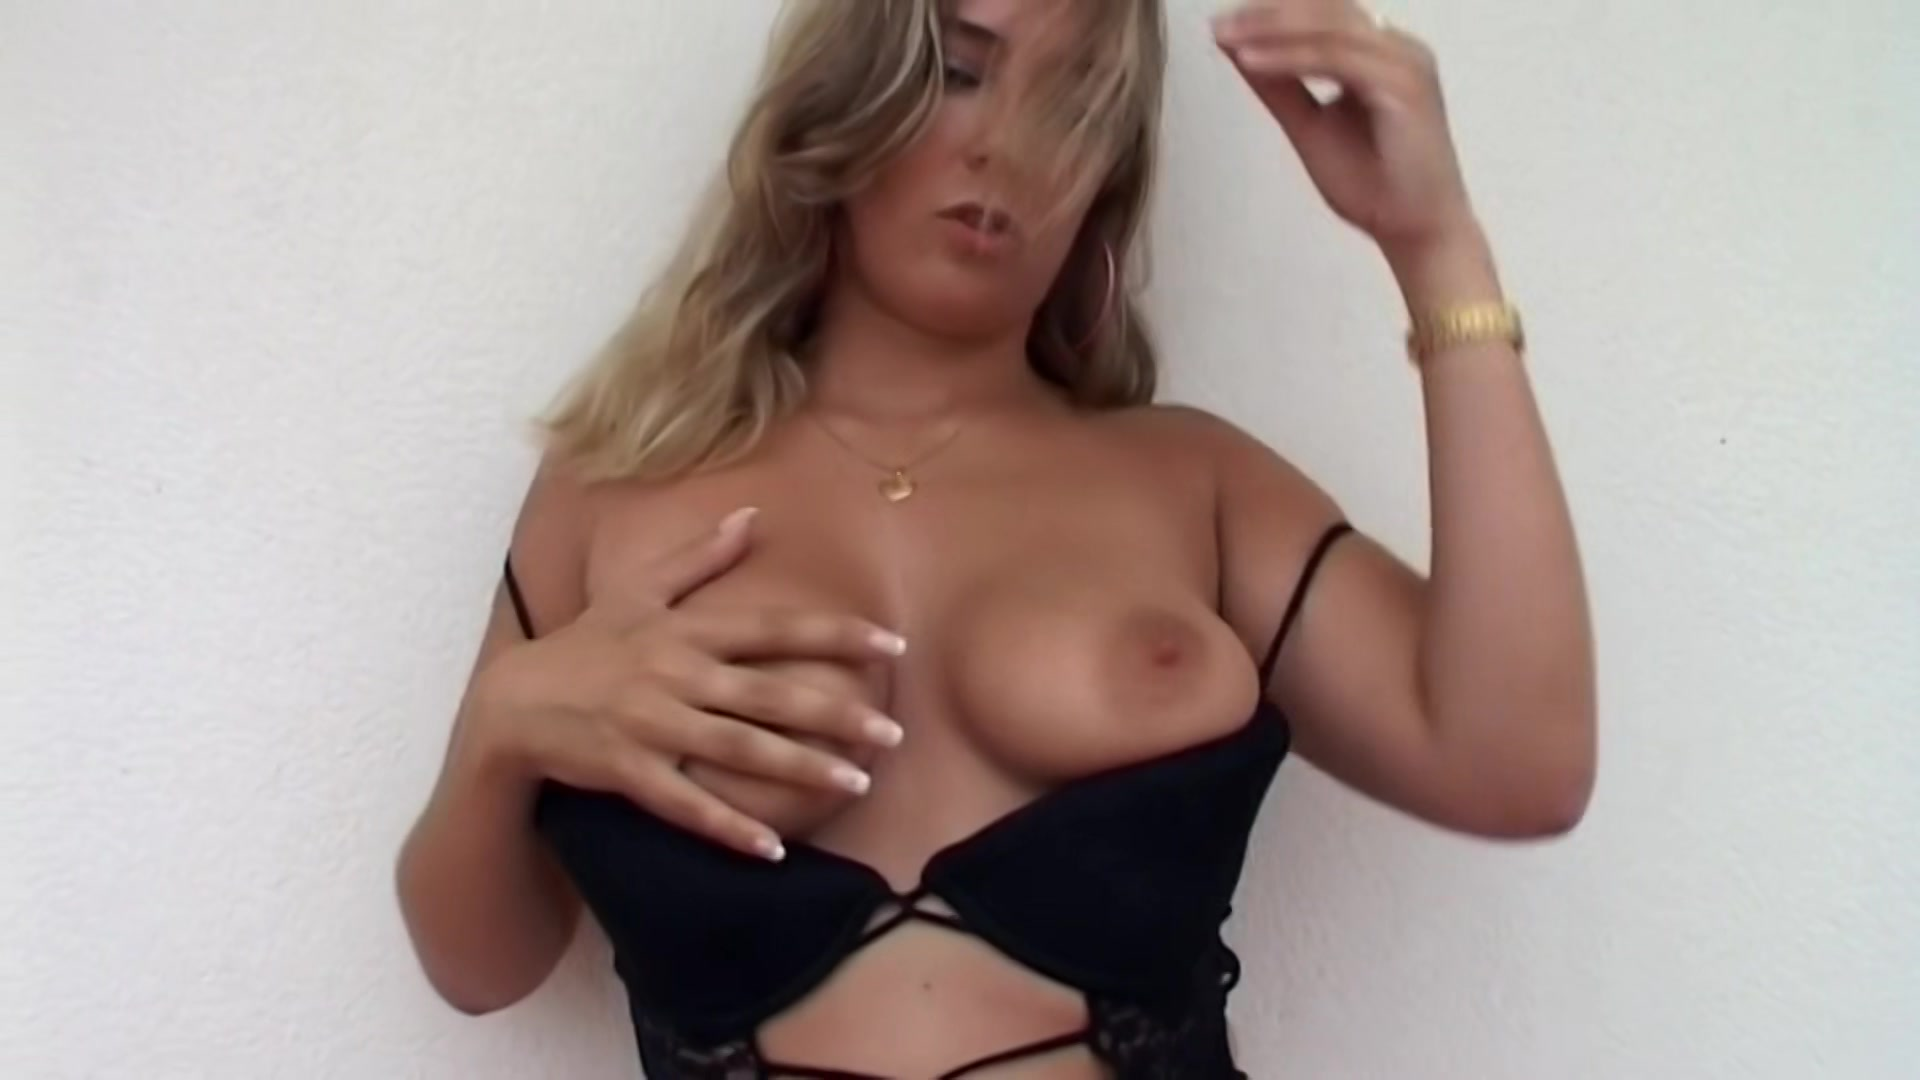 Amazing babe plays with boyfriend039s cock stardustporn com 8